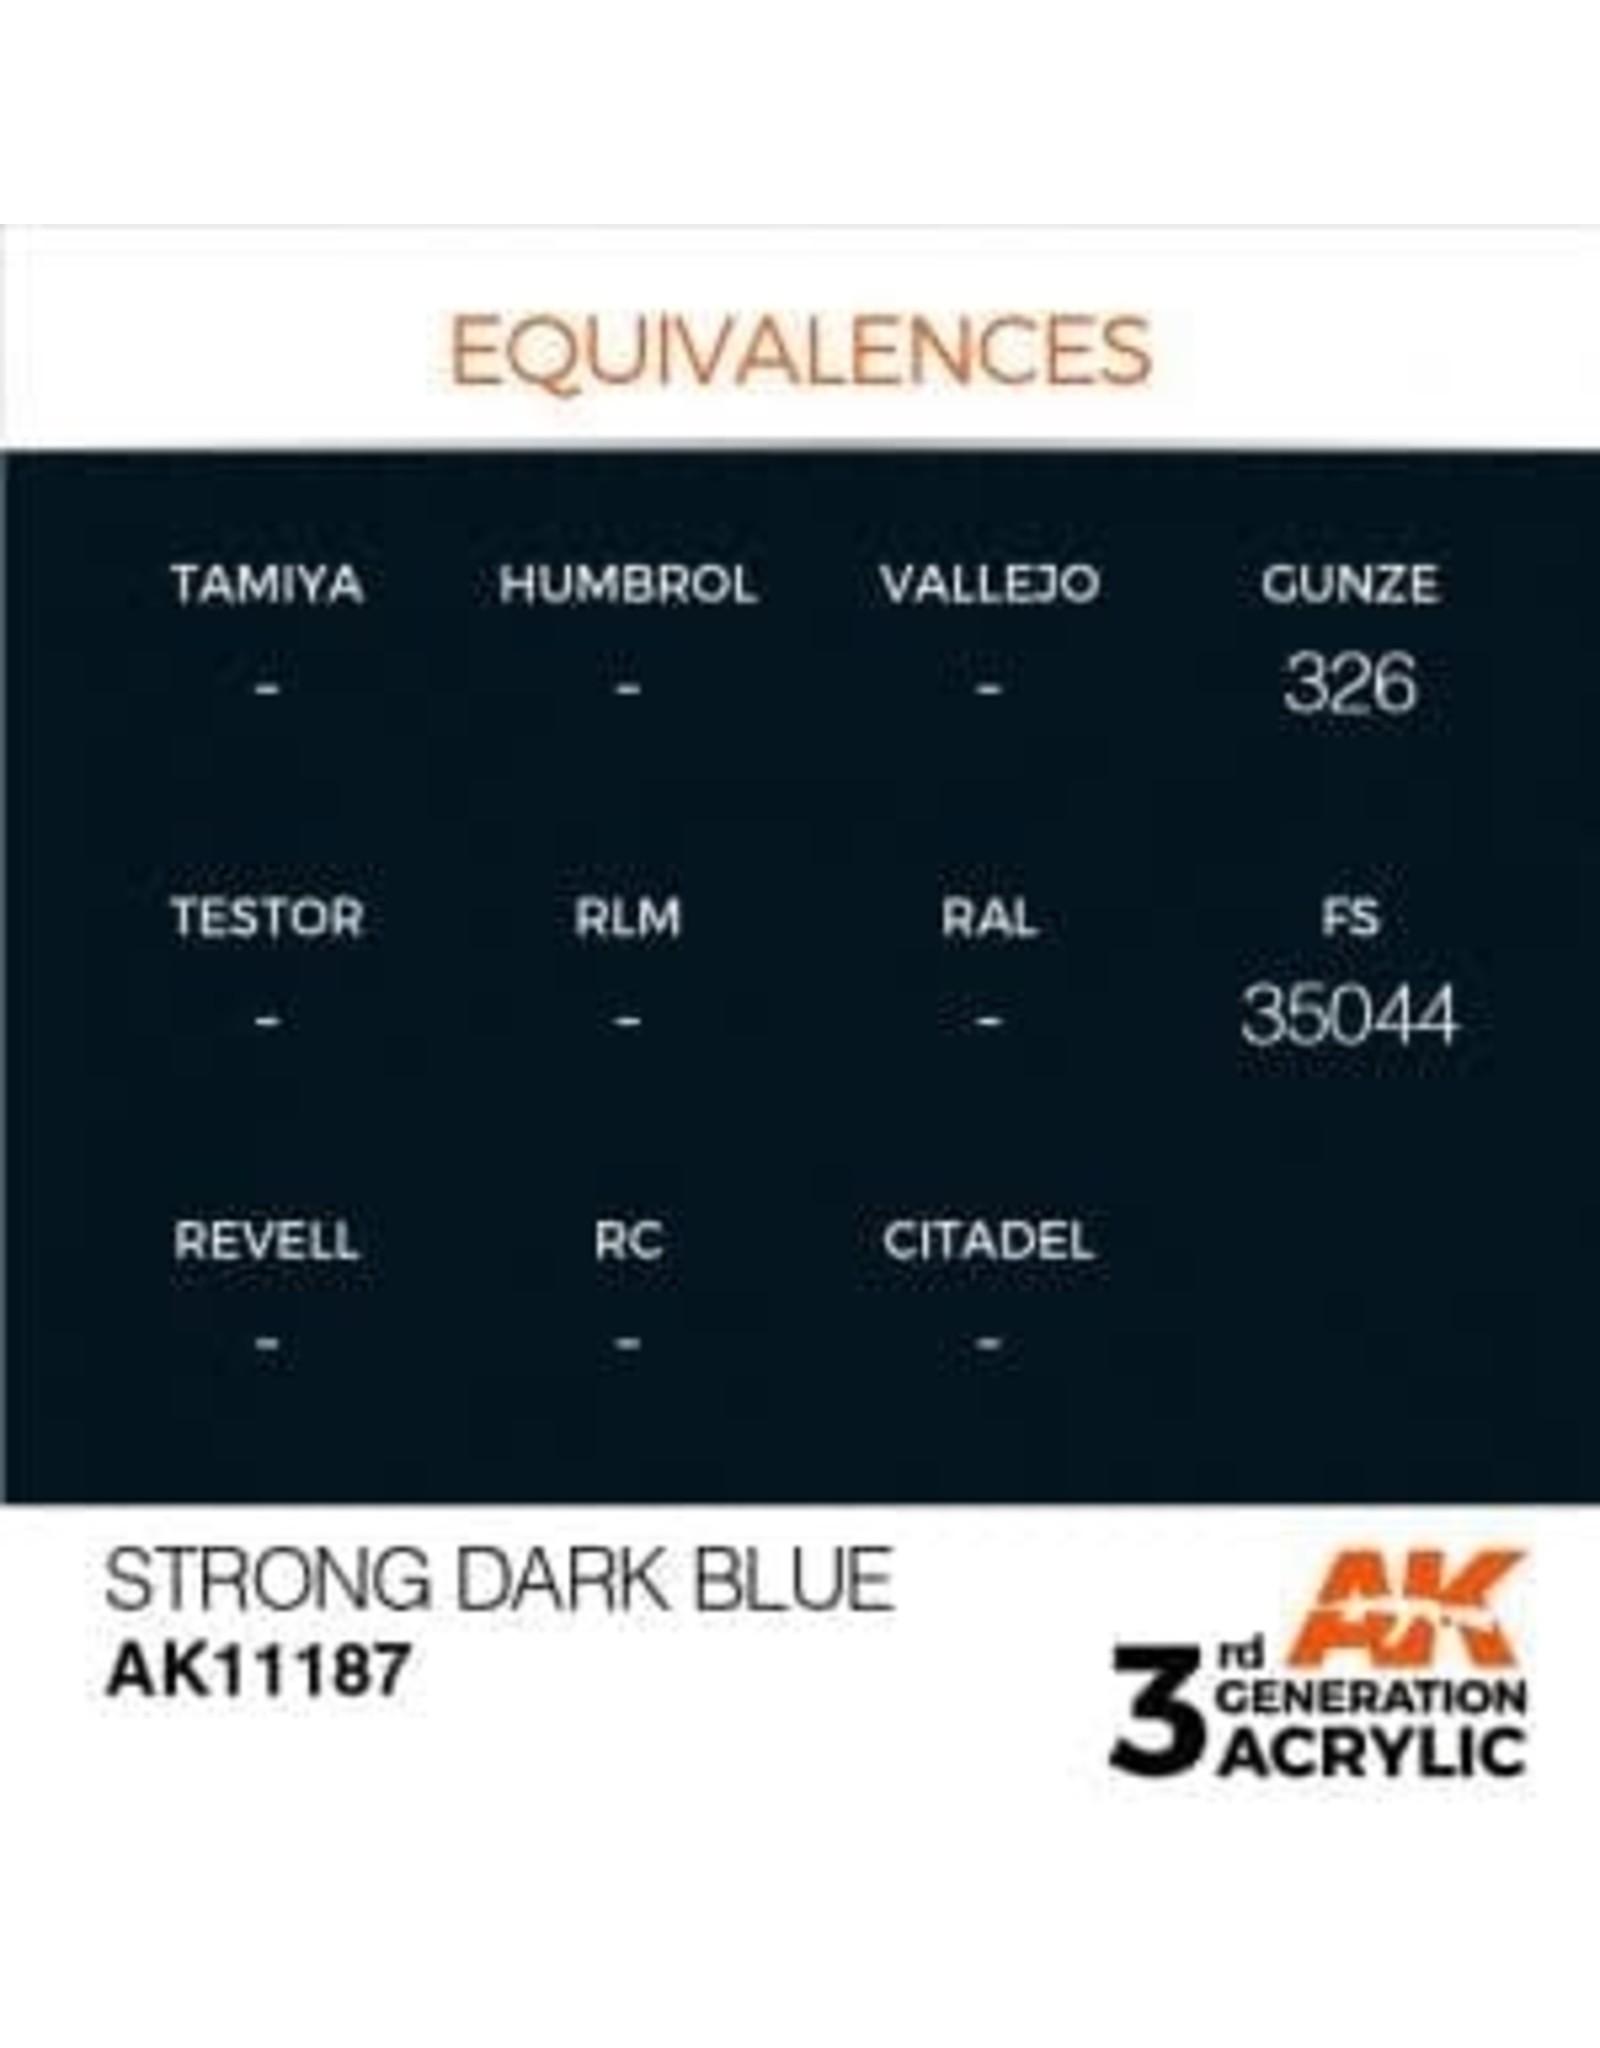 AK Interactive 3RD GEN ACRYLIC STRONG DARK BLUE 17ML